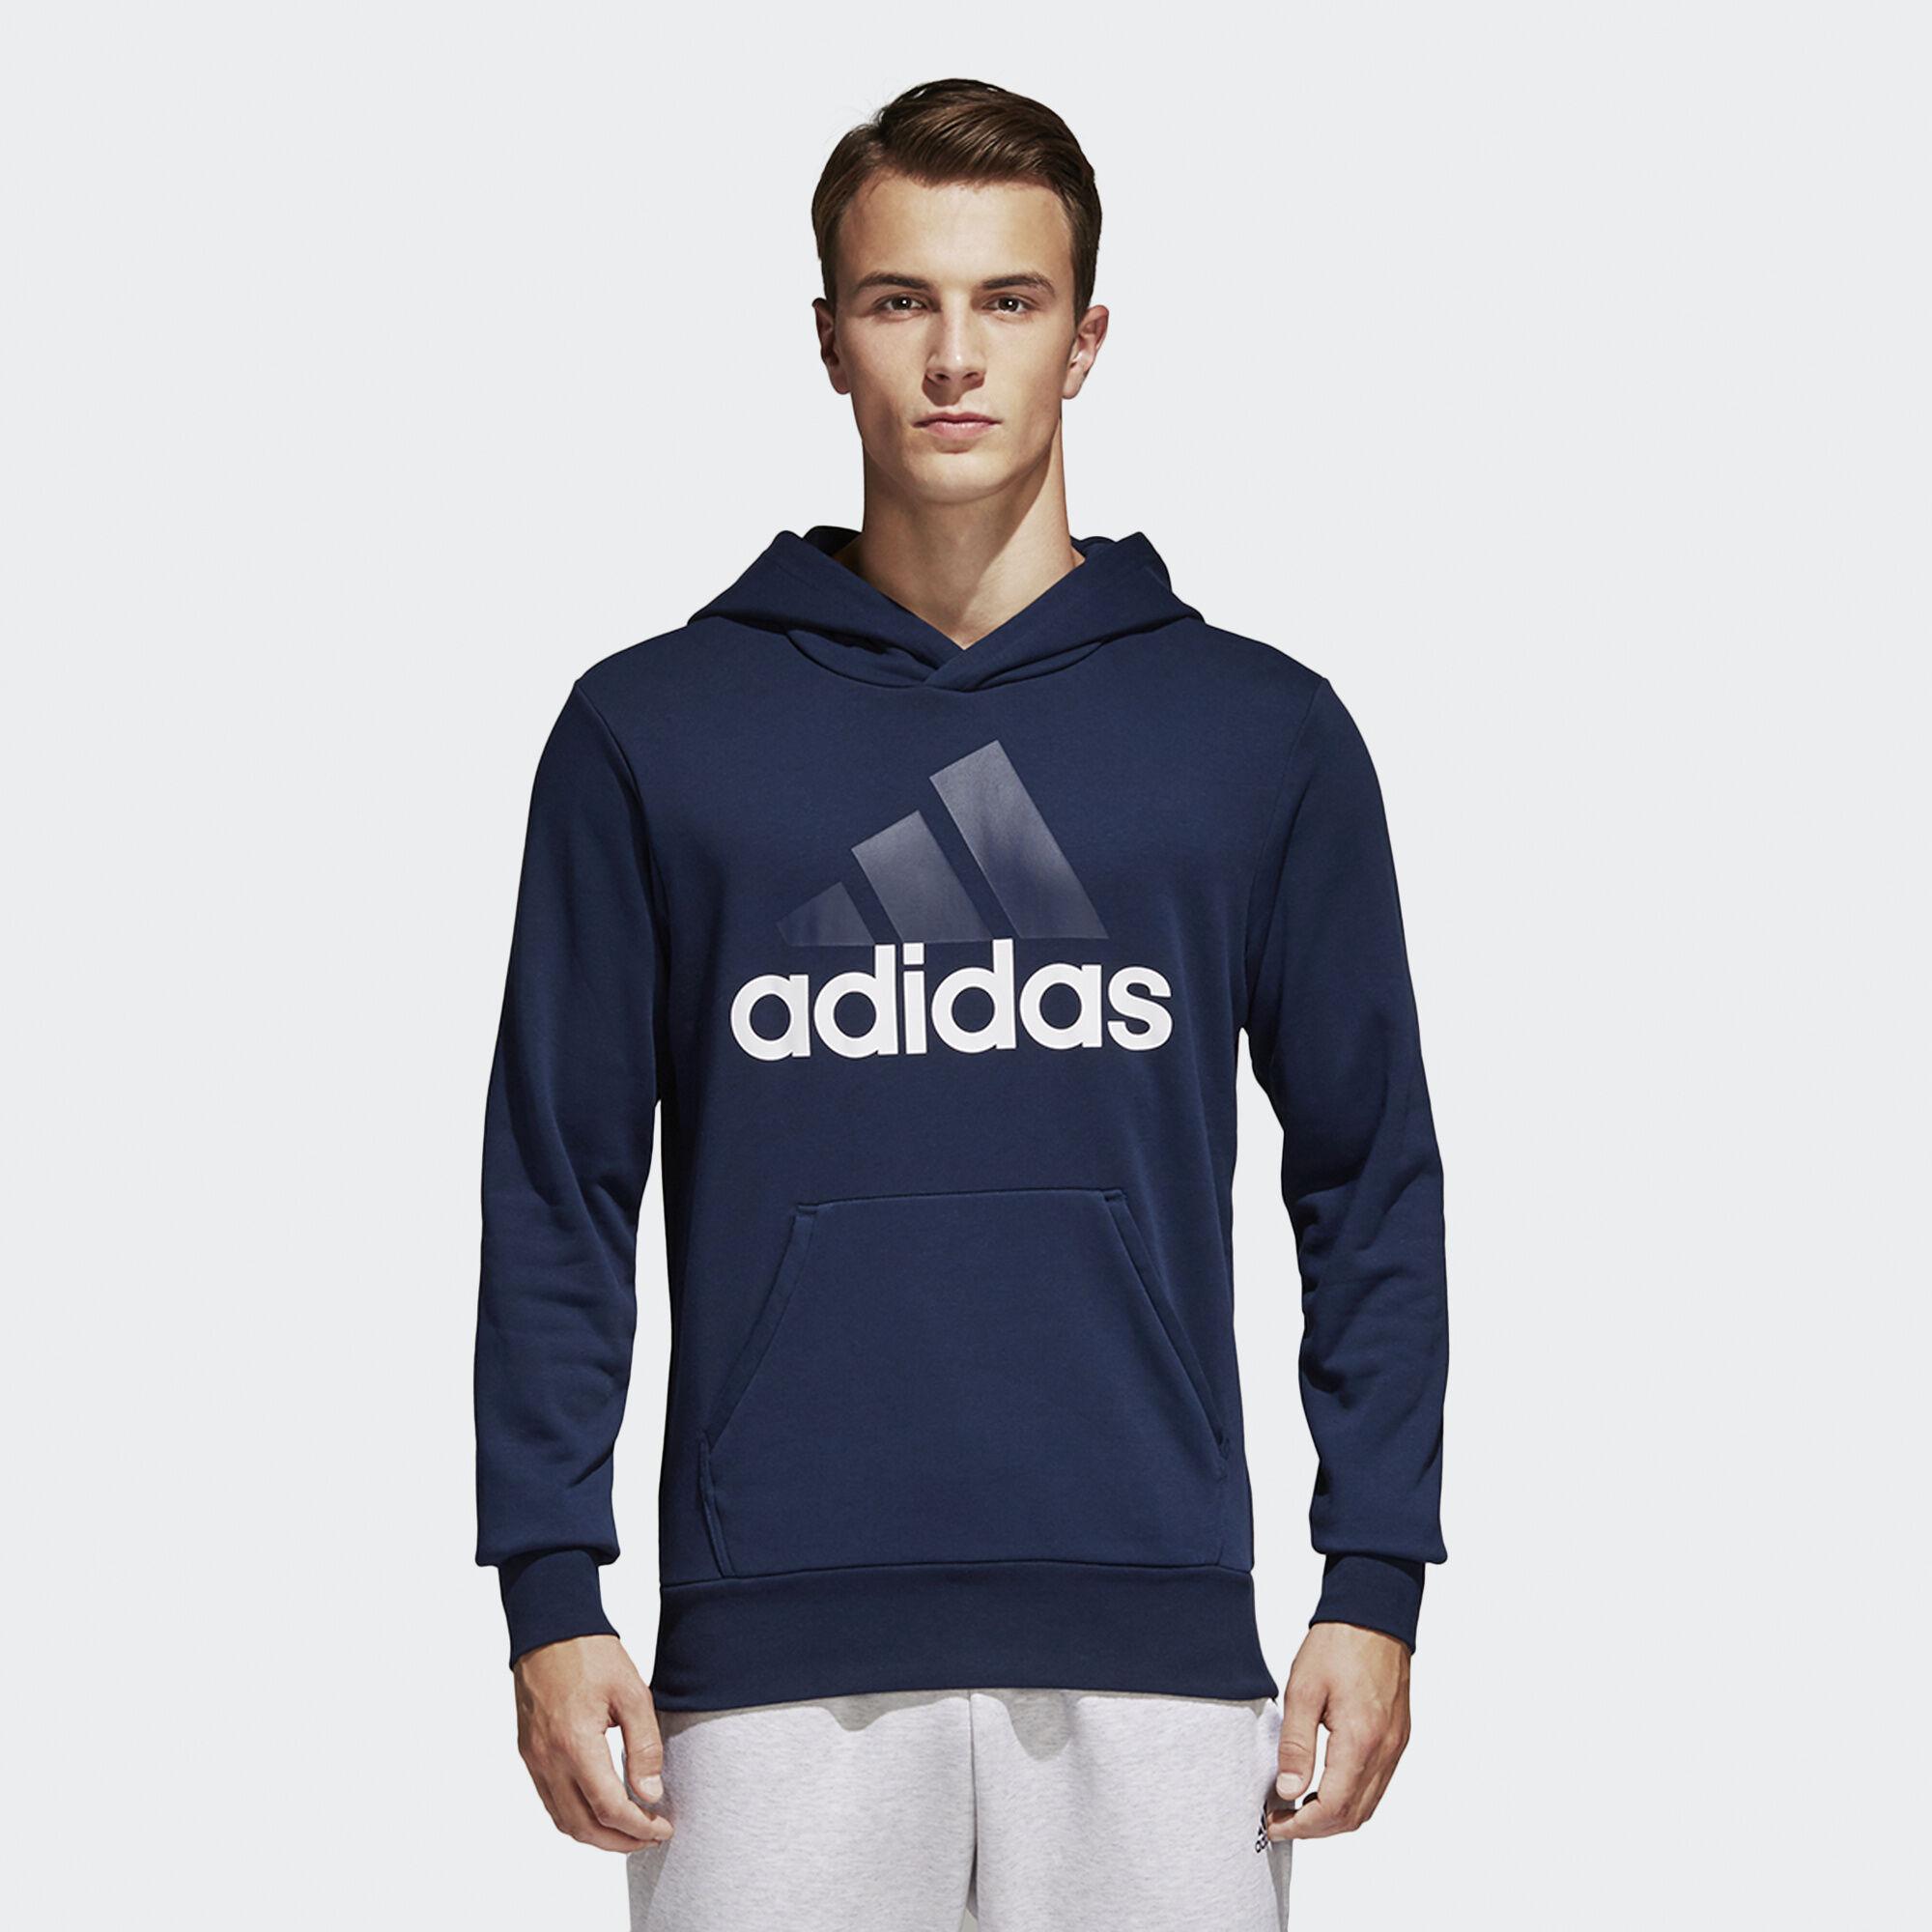 adidas - Essentials Linear Pullover Hoodie Collegiate Navy/White B45730